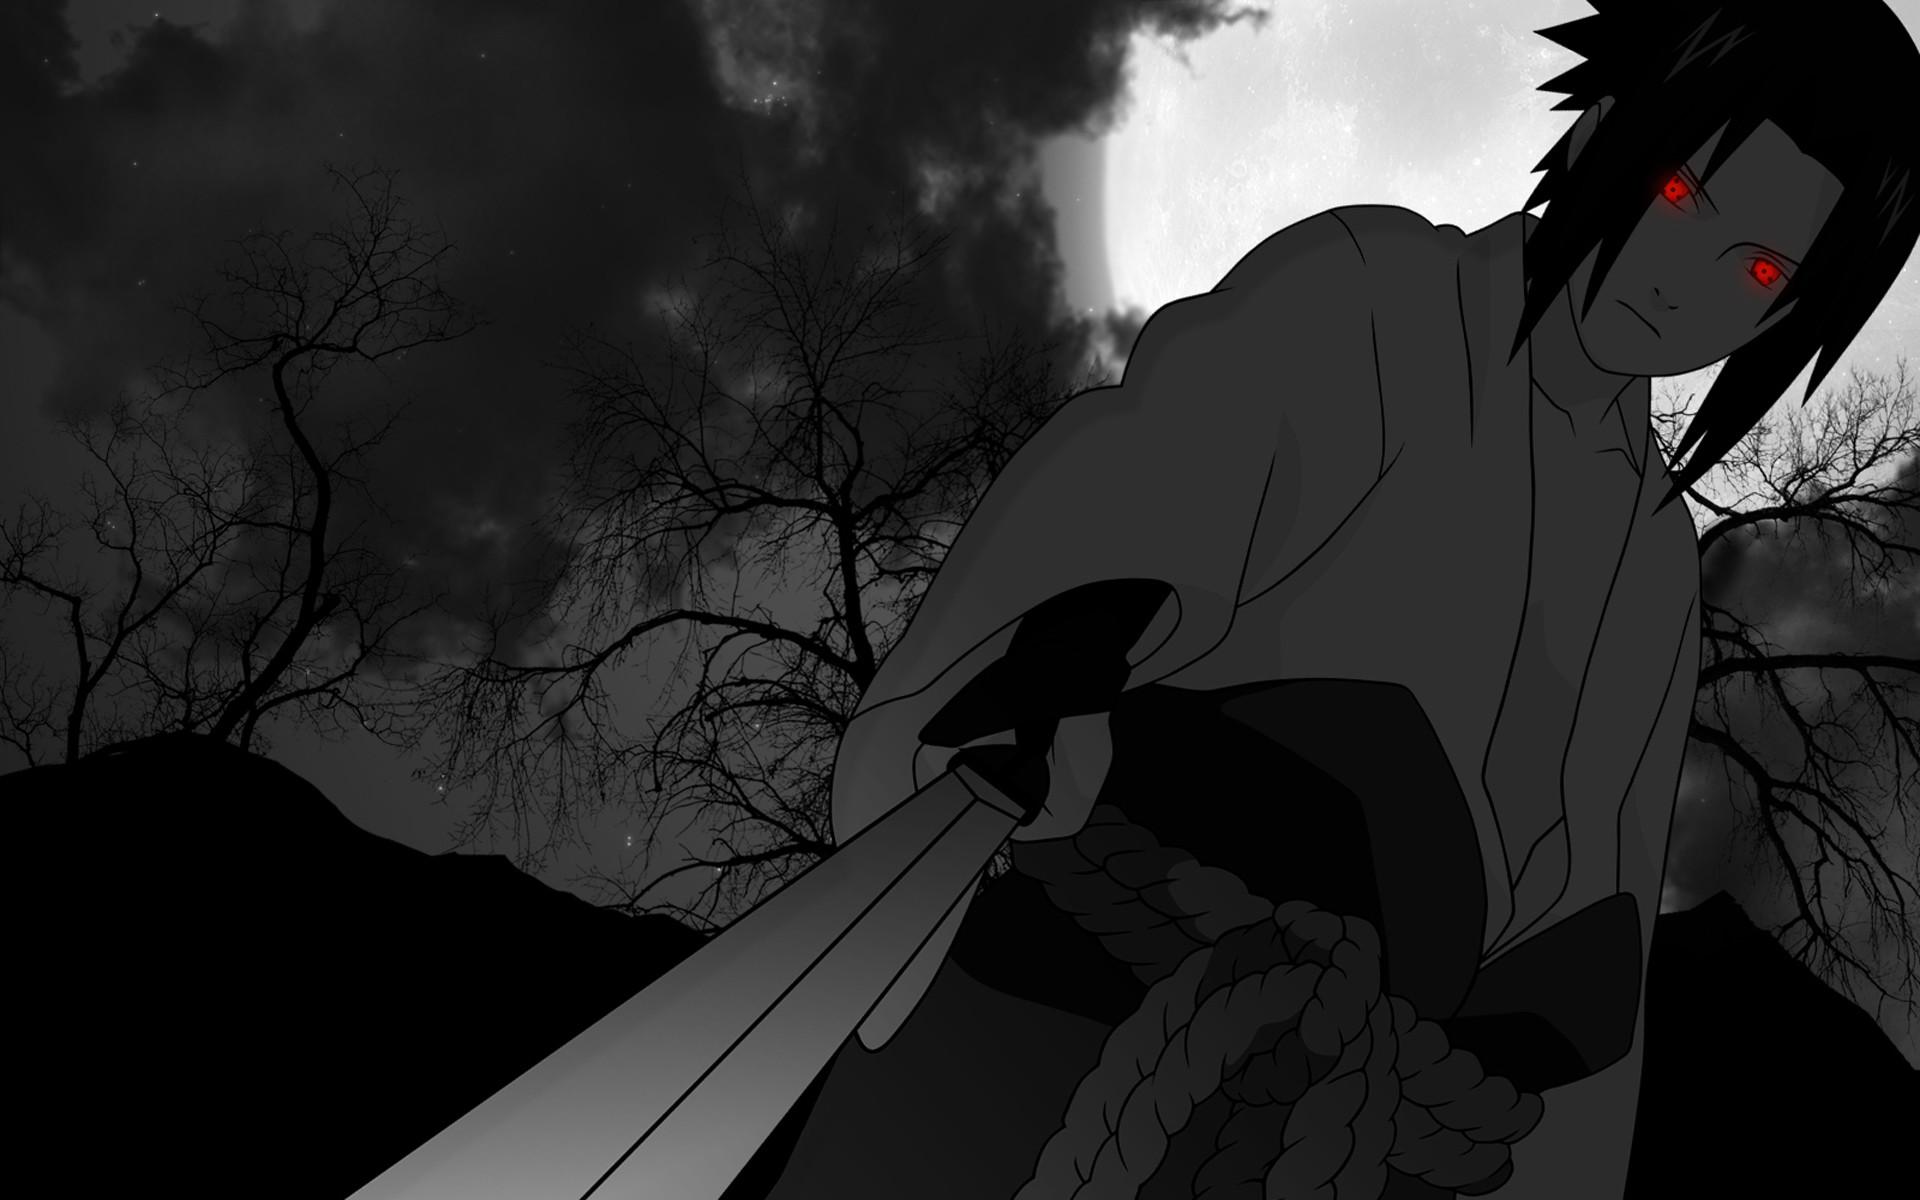 sasuke uchiha sharingan eyes sword wallpaper 1920x1200 1920x1200